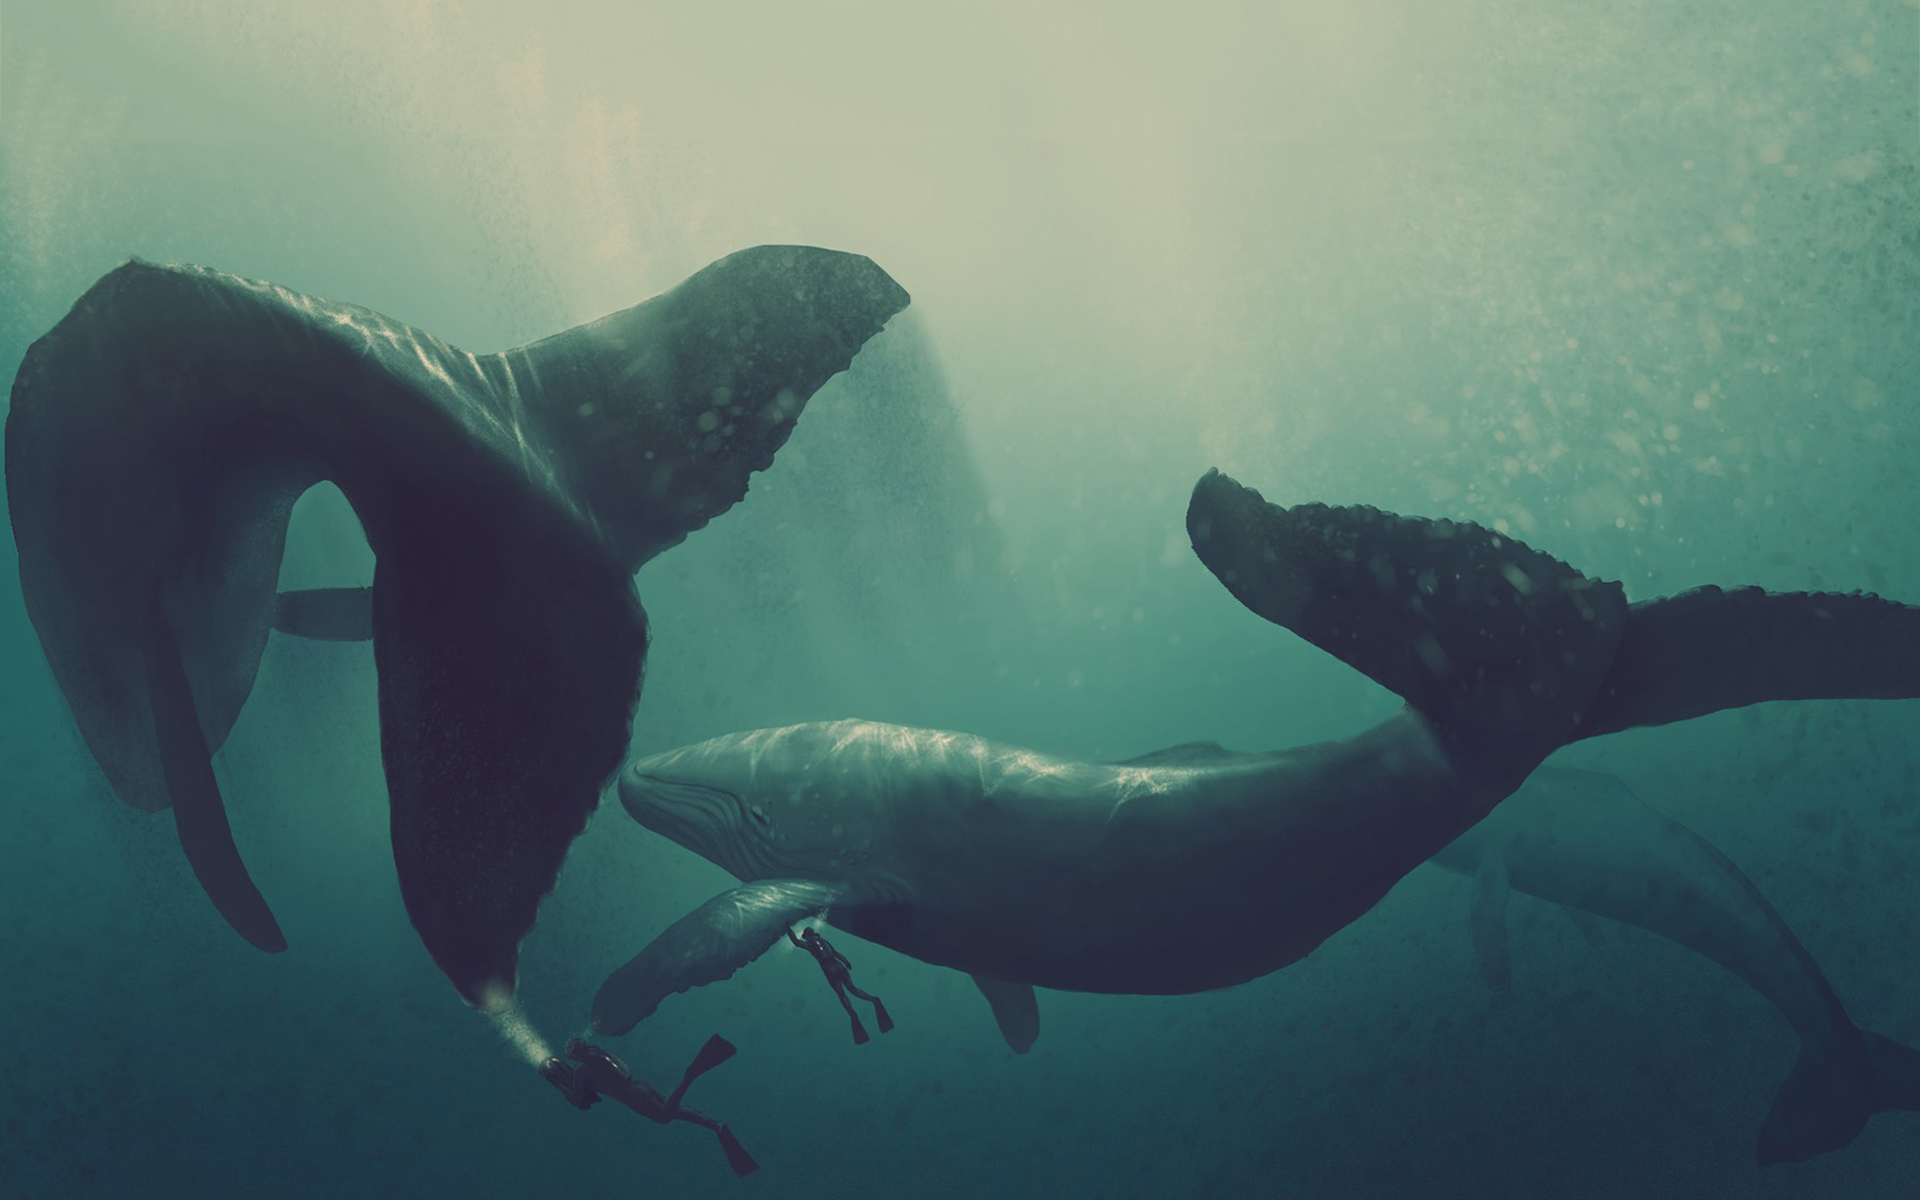 Whales divers art